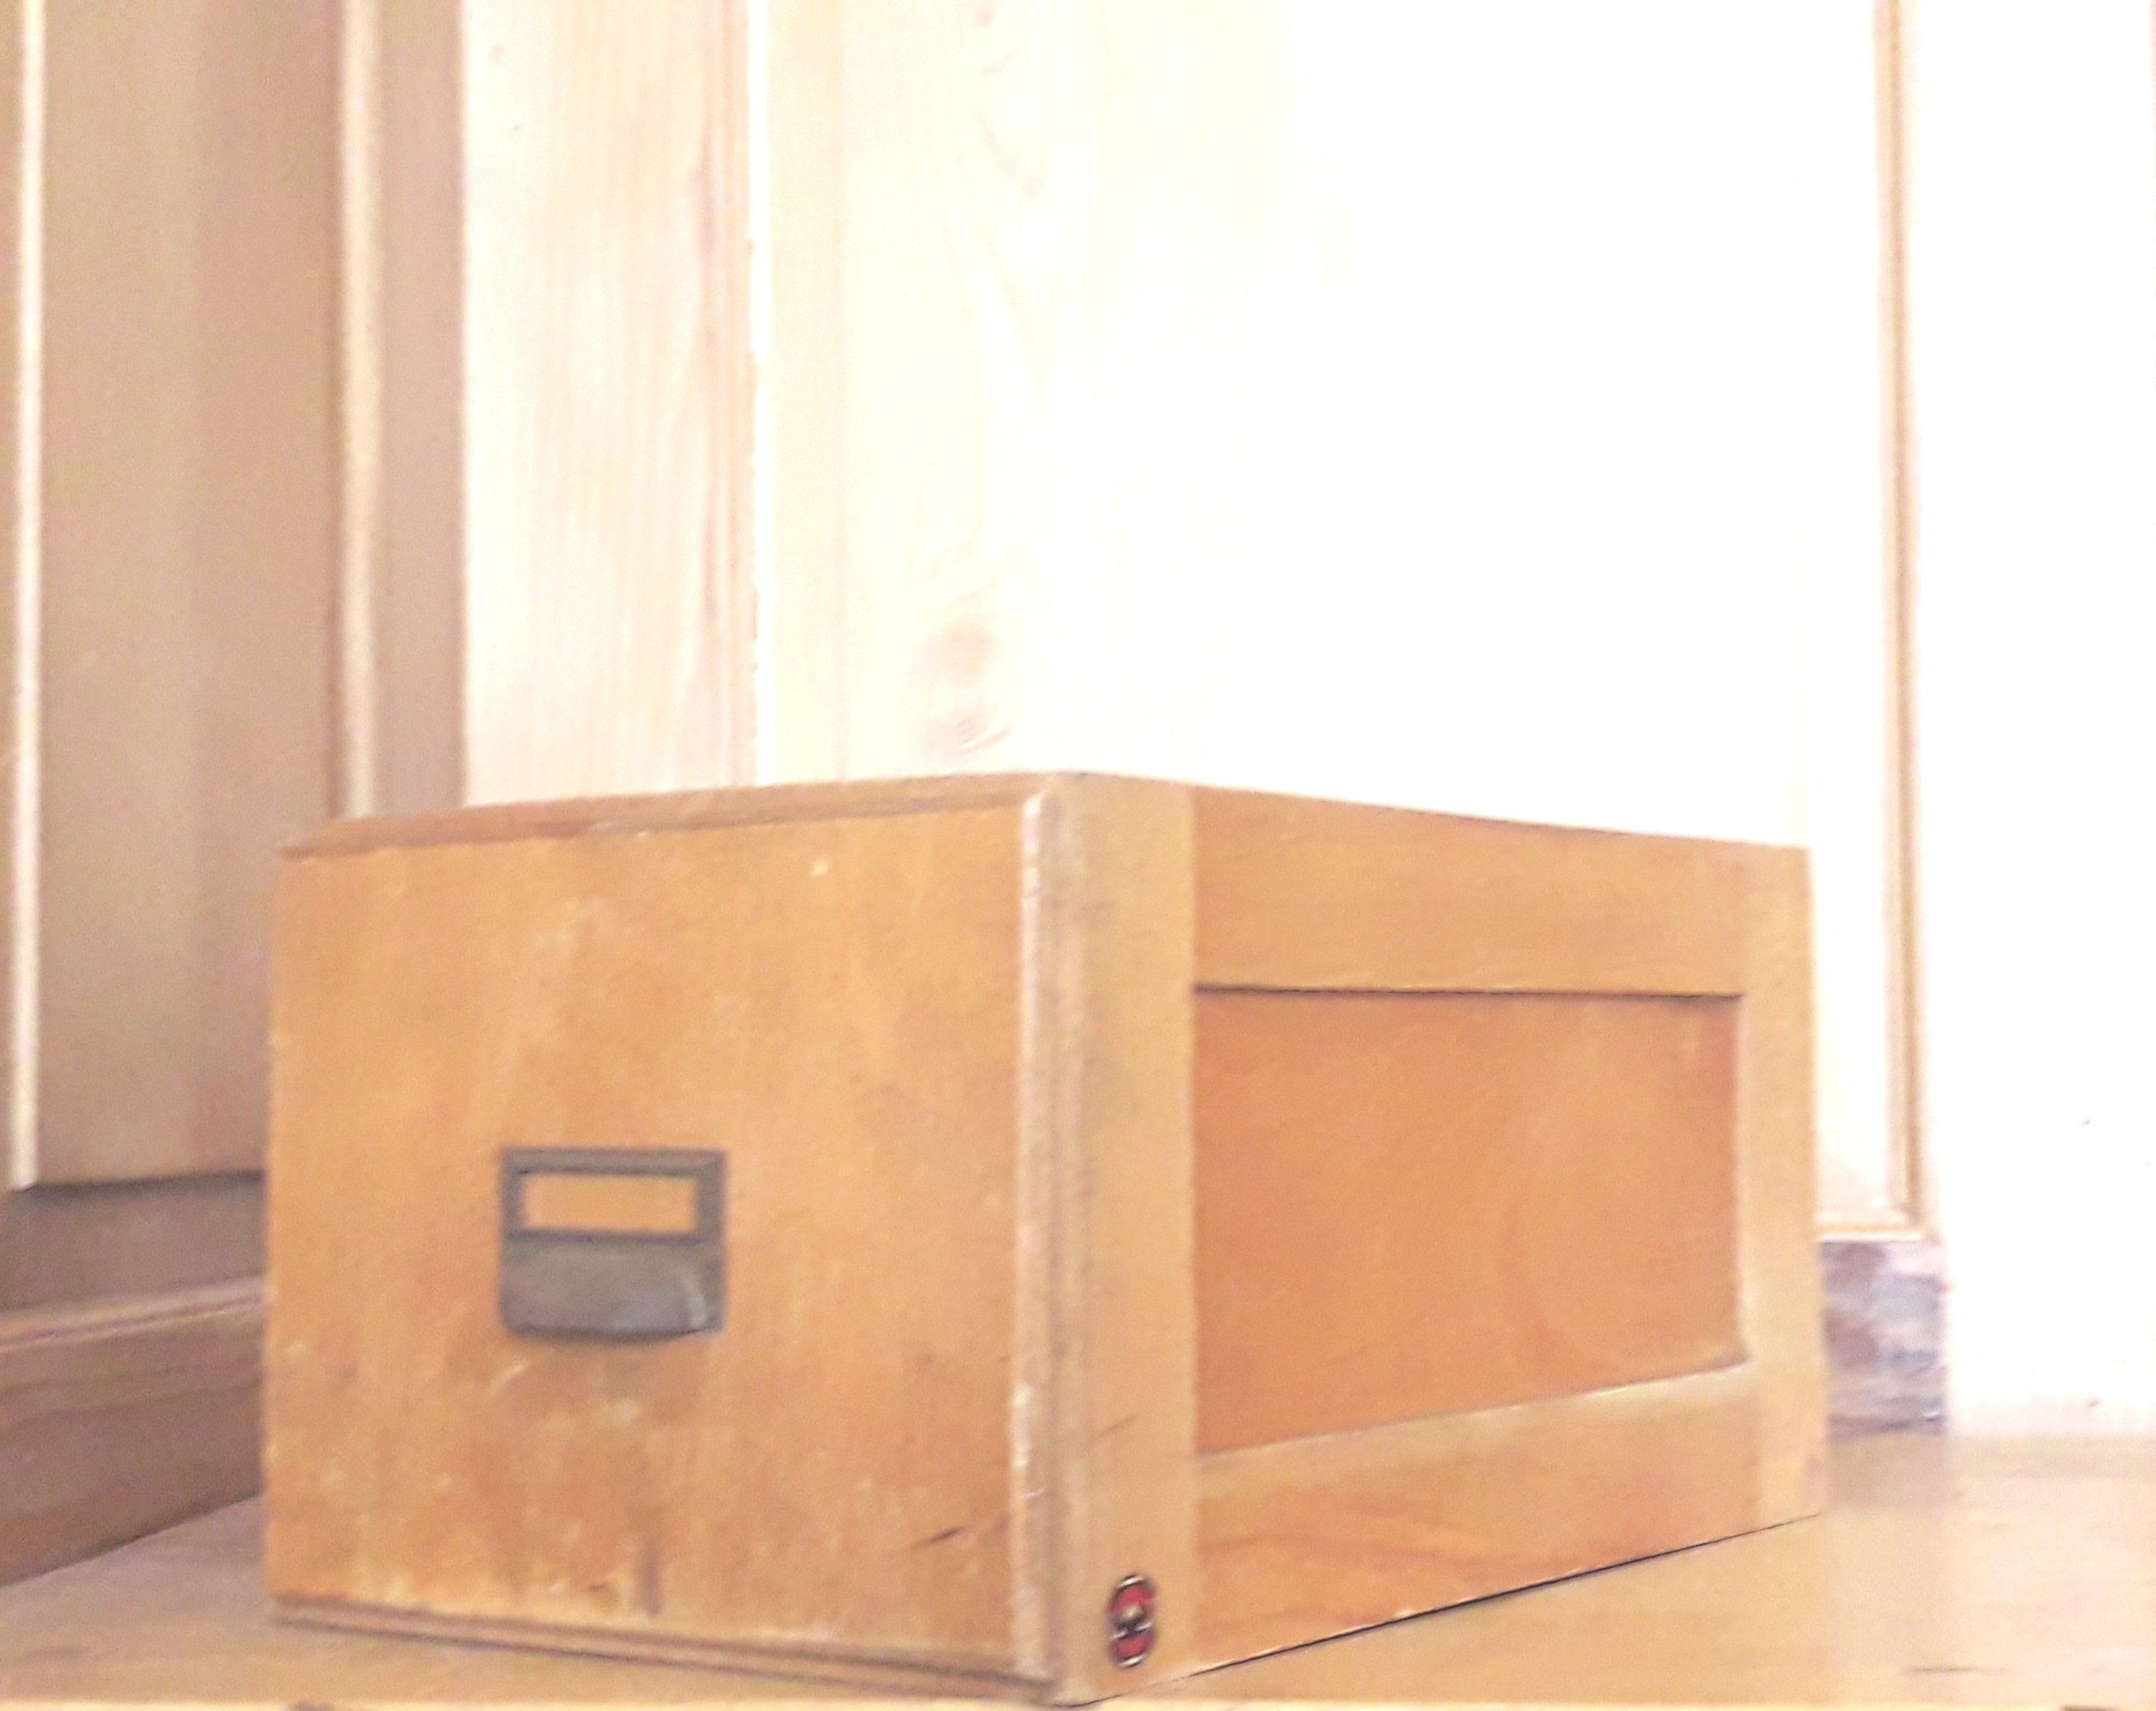 Apotheker Schubladen Bauhausstil Bibliothekskatalog Aktenschrank Vintage Decor Furniture Home Decor